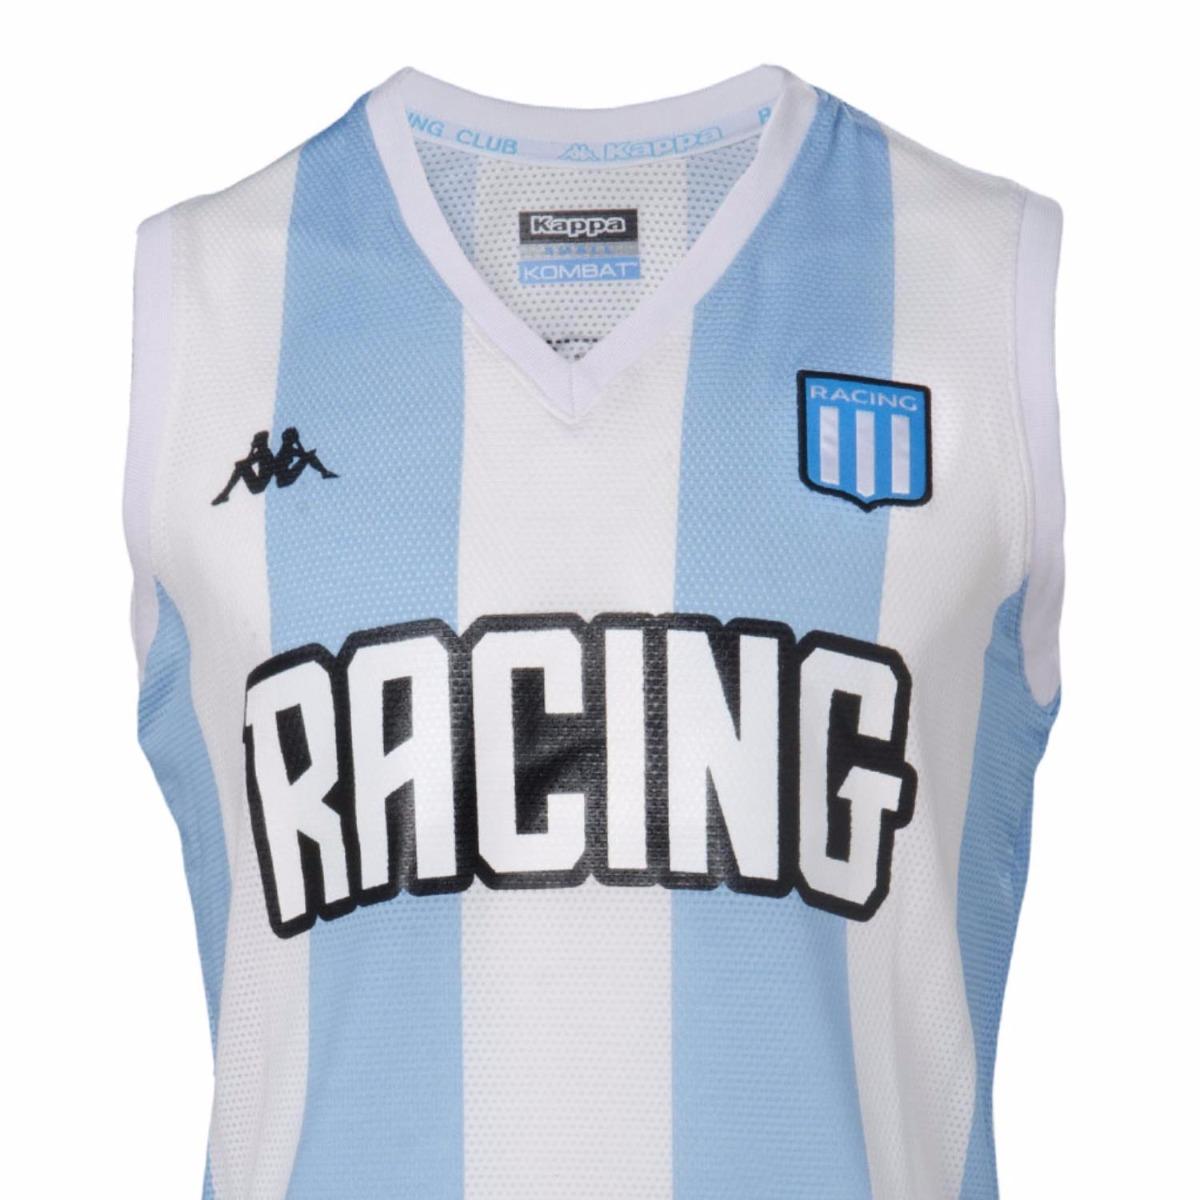 b4d4a1b3387ff Camiseta Racing Basquet Kappa 2018 Envíos A Todo El País -   999